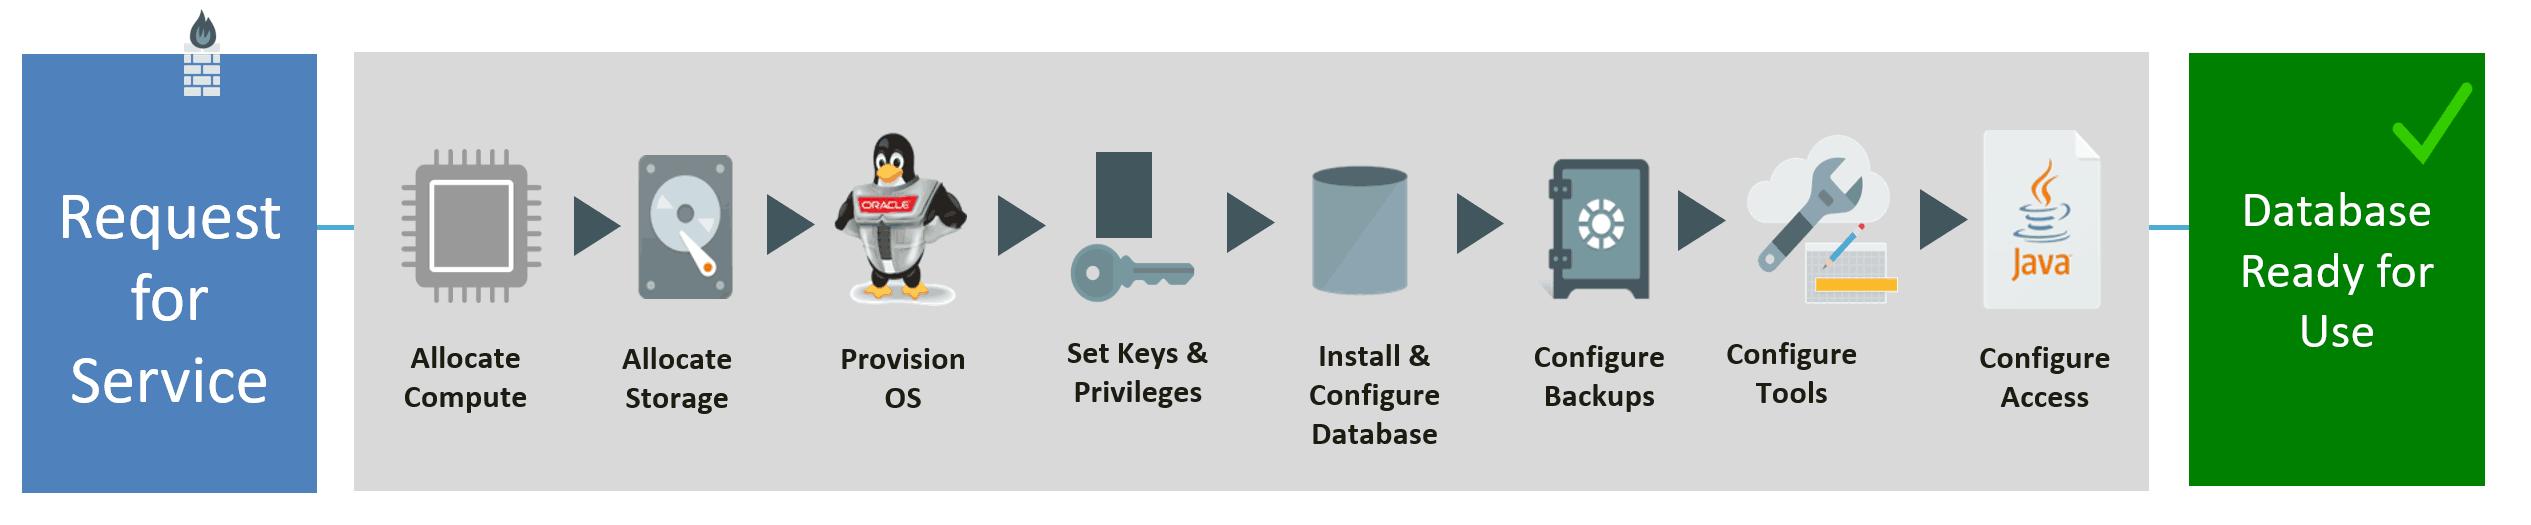 Deploying database on cloud